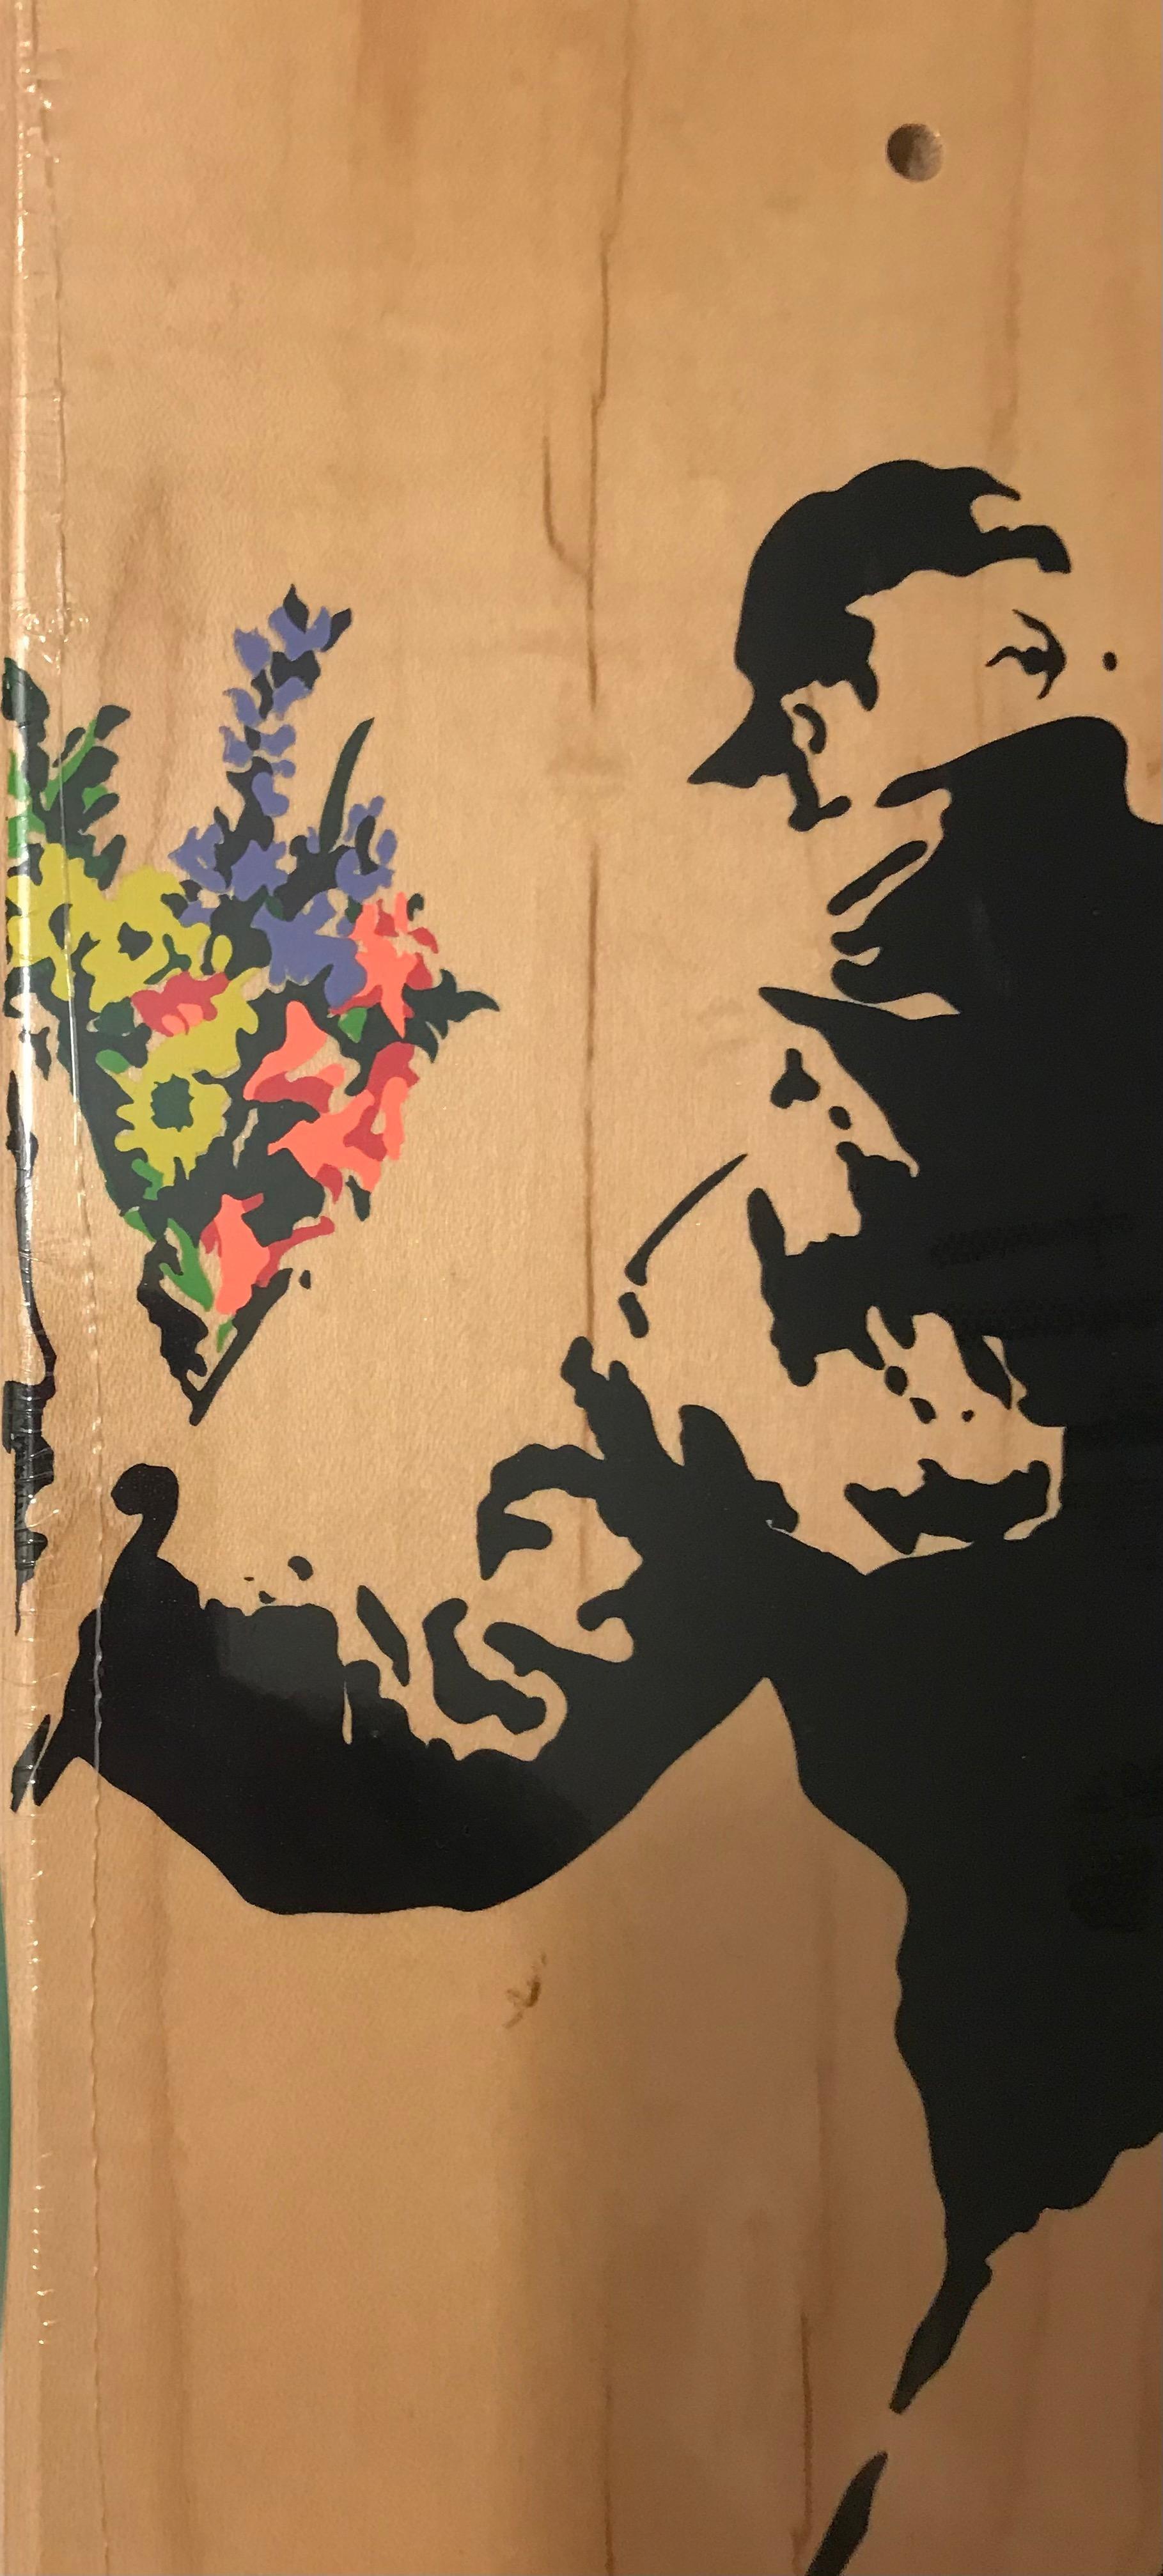 Banksy Flower Thrower Skate Deck Colored Edition, 2016 Brown Bethlehem Pop Art